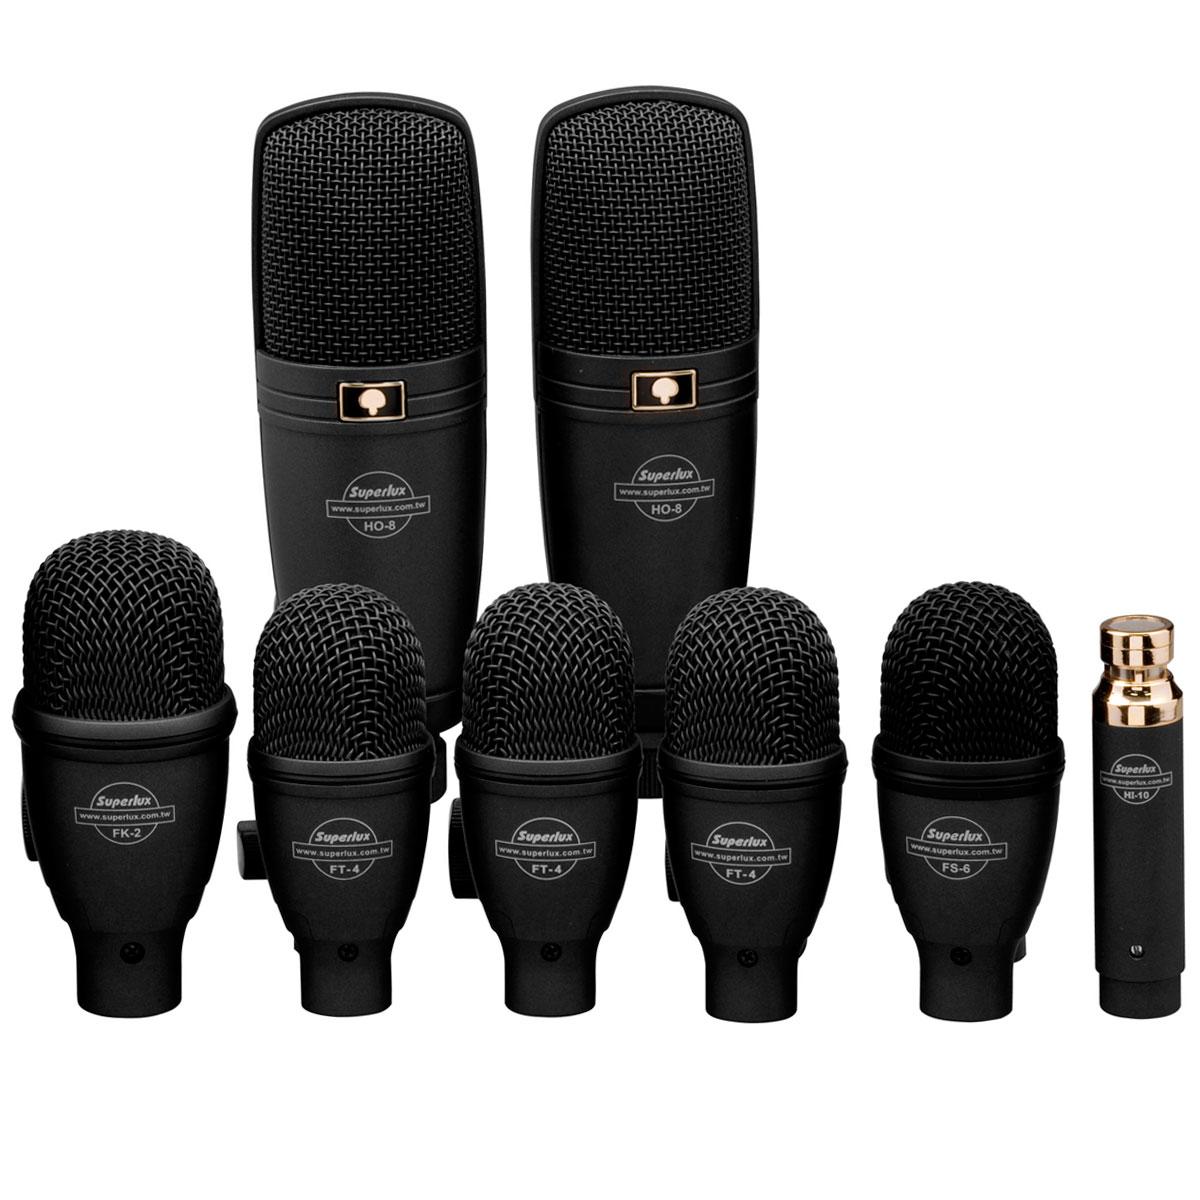 DRKF5H3 - Kit 8 Microfones c/ Fio p/ Instrumentos DRK F5 H3 - Superlux